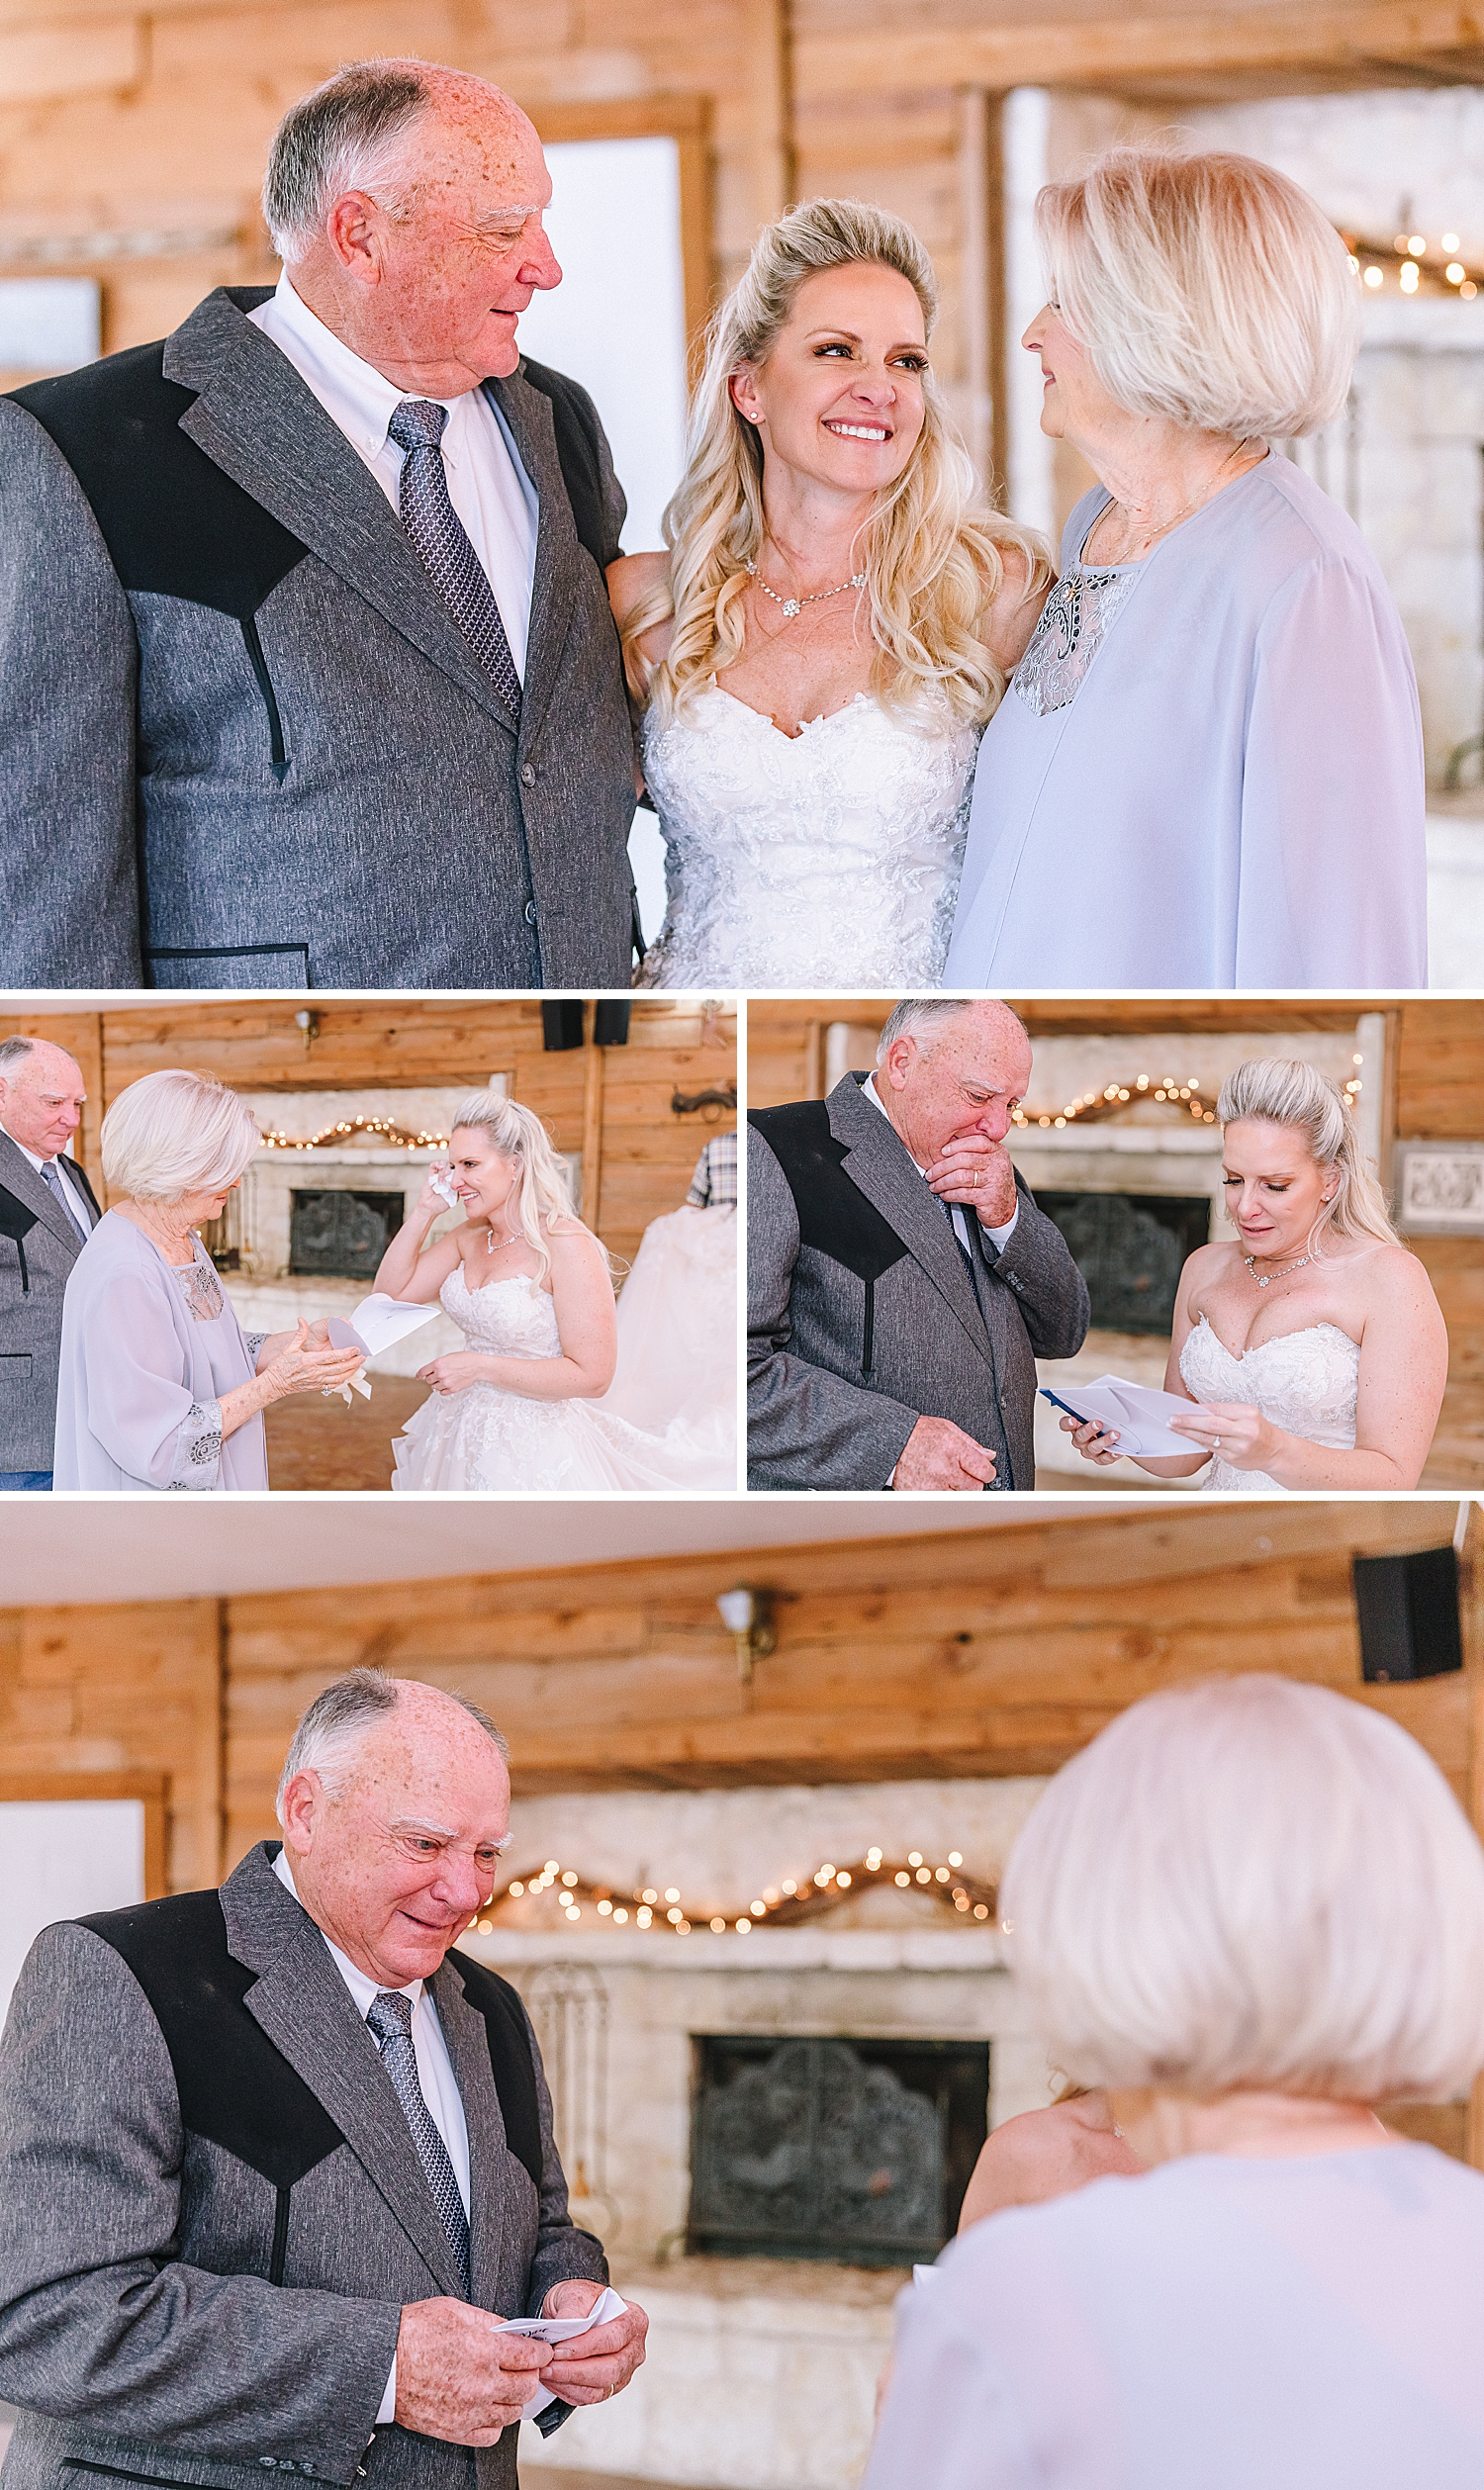 Rio-Cibilo-Ranch-Marion-Texas-Wedding-Rustic-Blush-Rose-Quartz-Details-Carly-Barton-Photography_0022.jpg